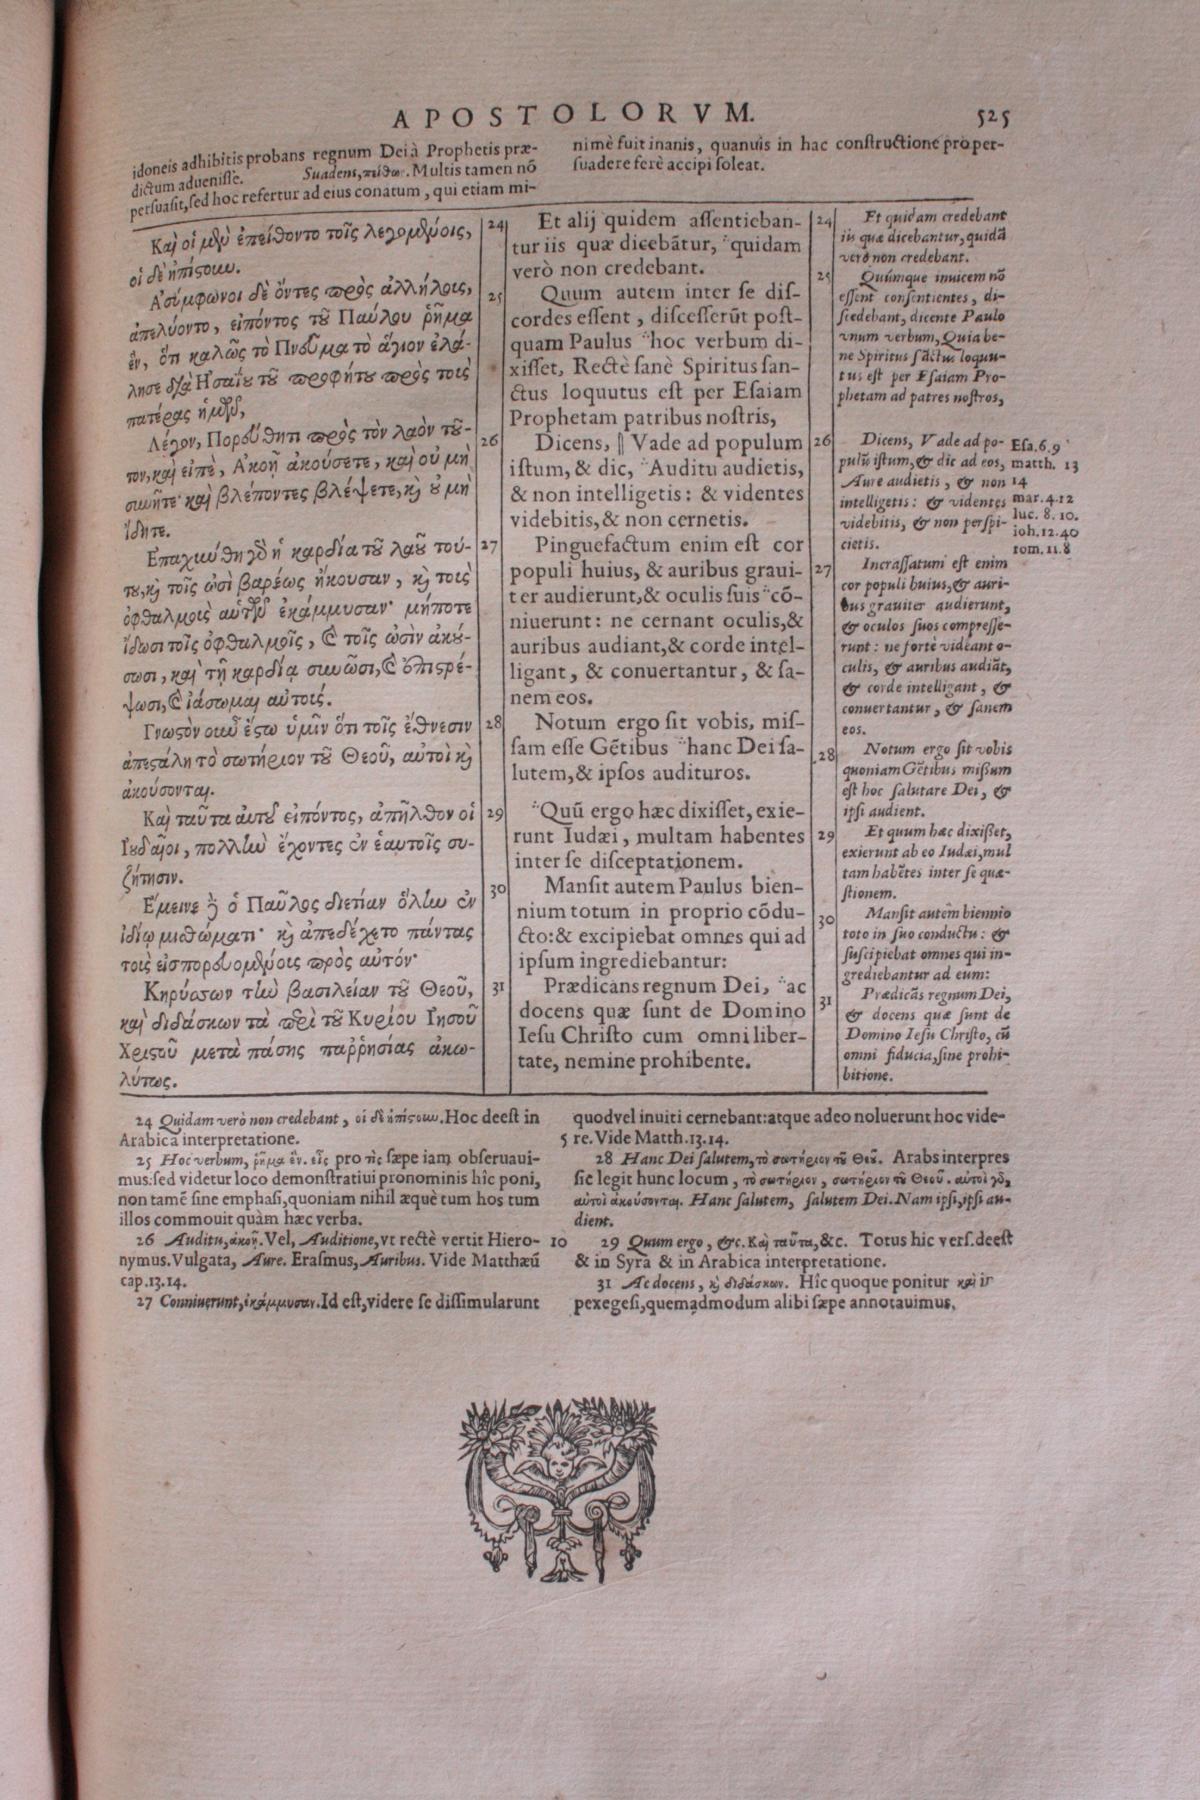 Griechische-Lateinische Bibel, Novum Testamentum 1582-11